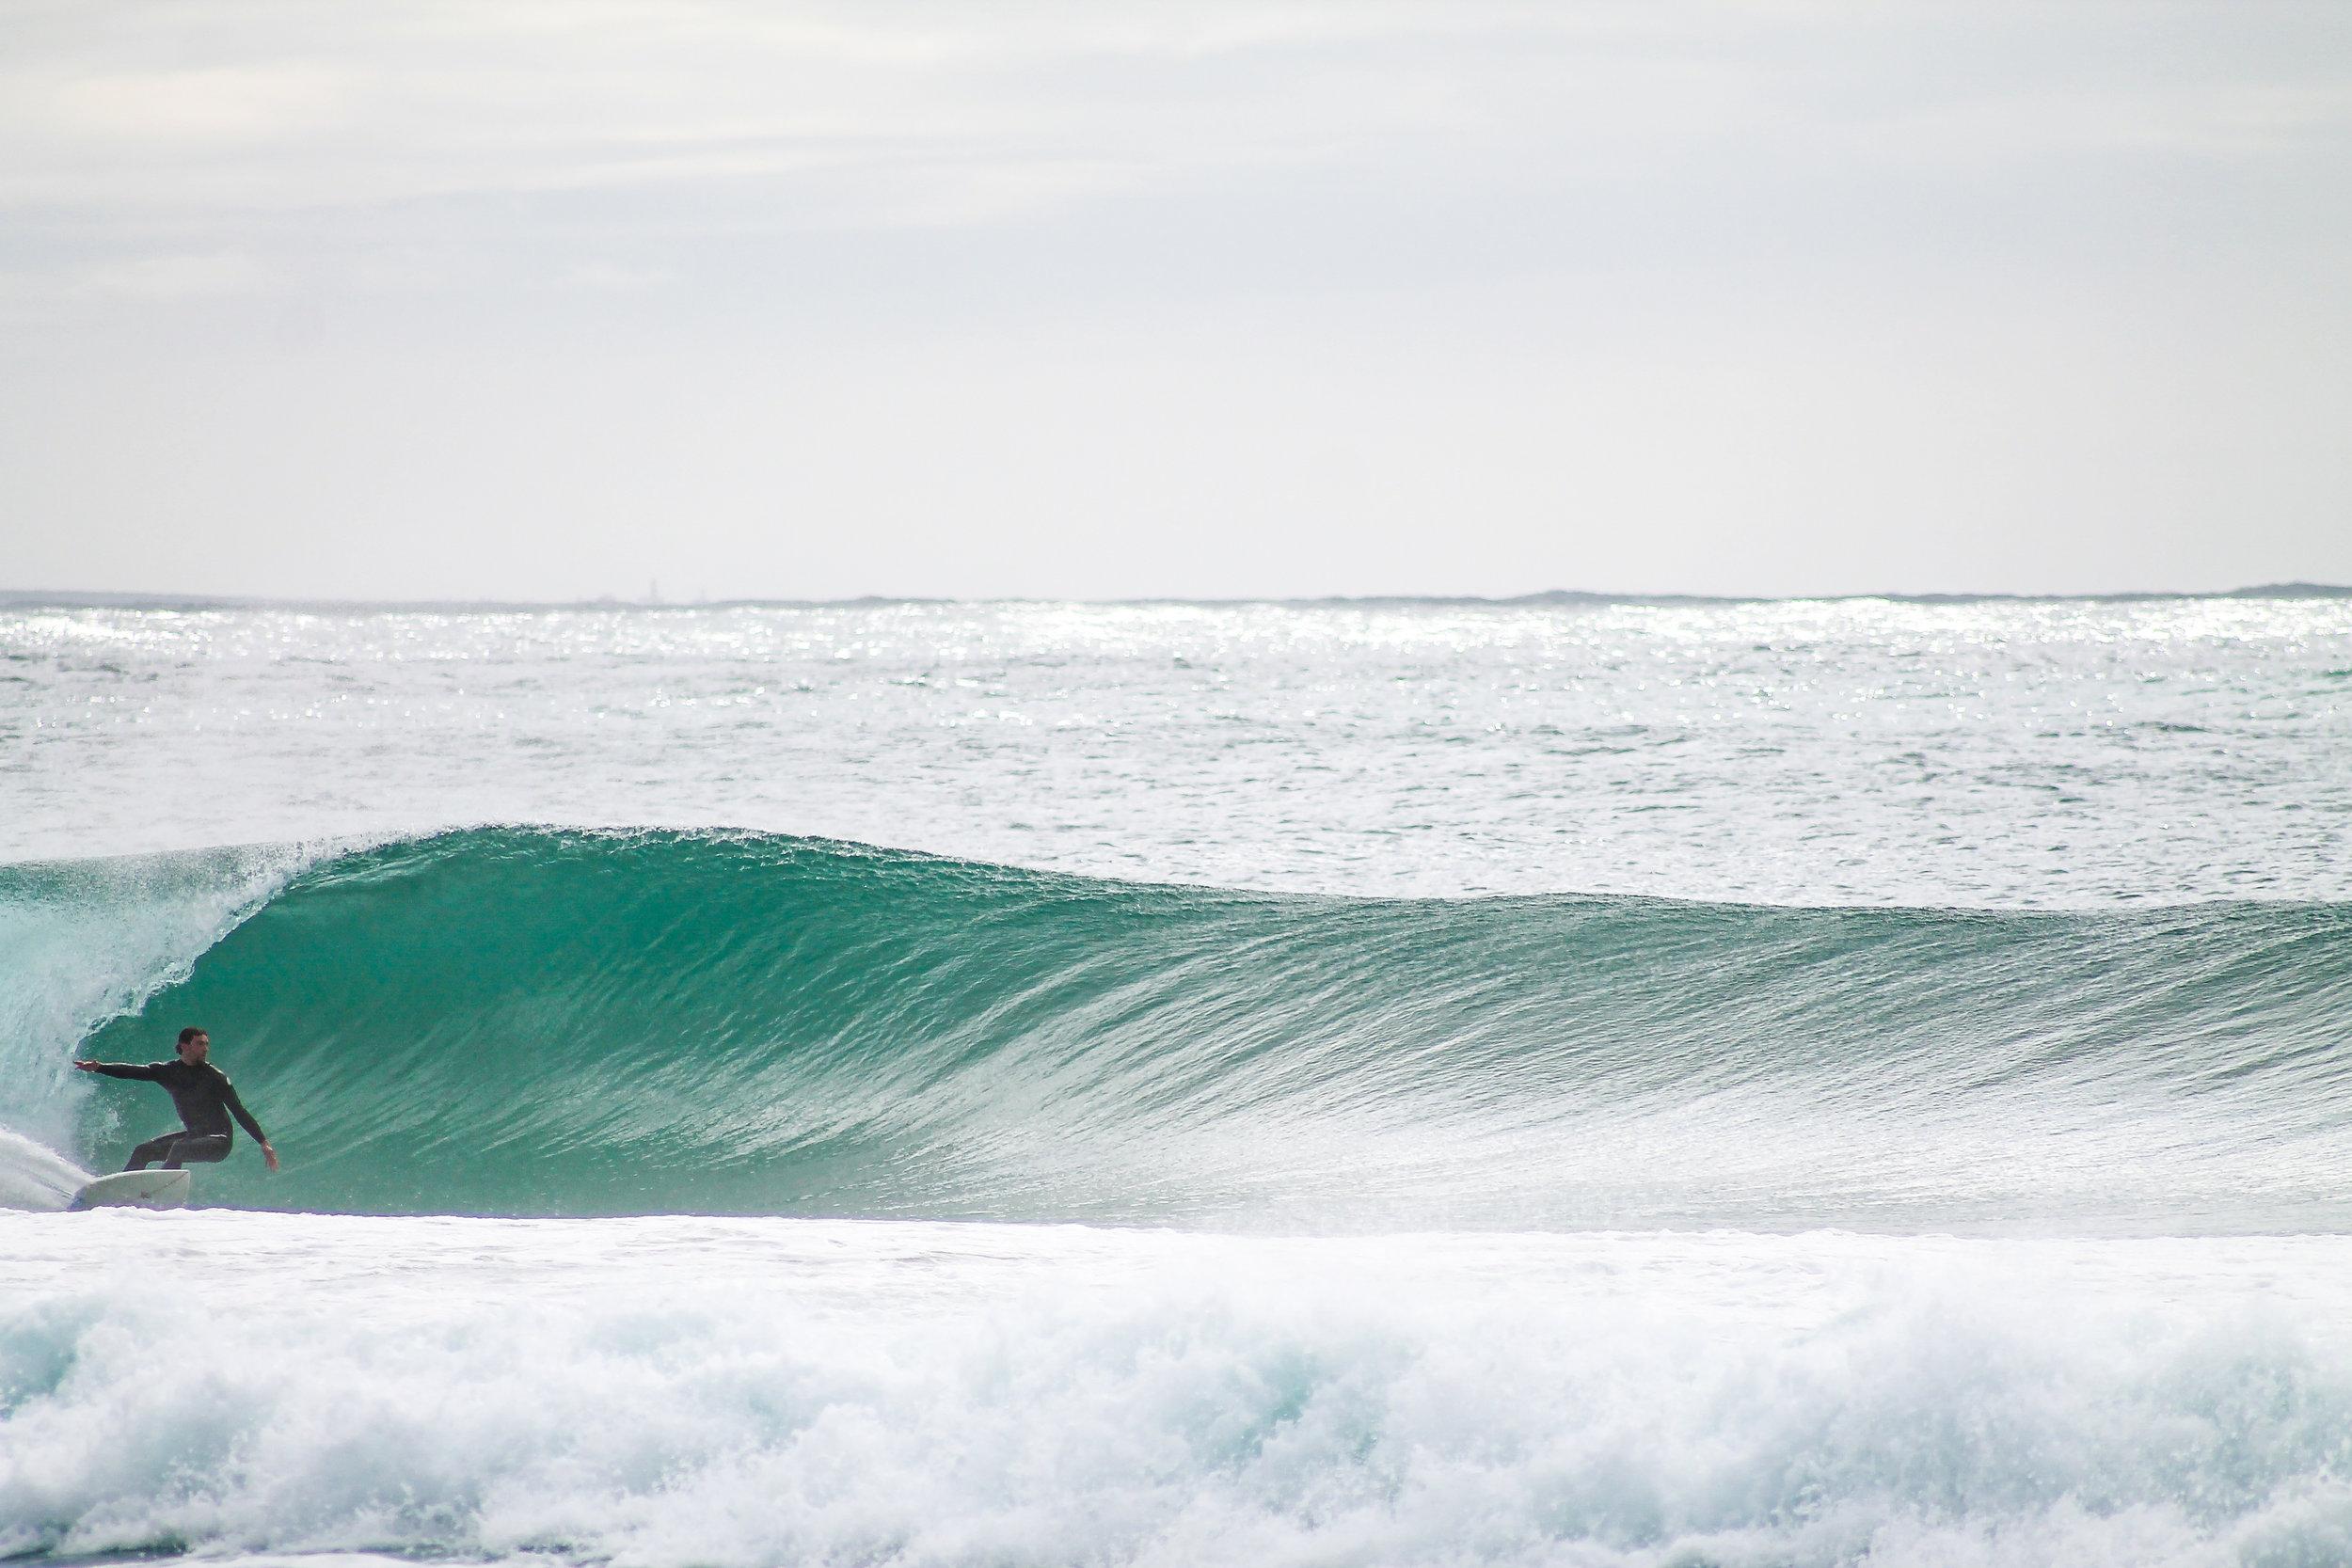 Surfing in Western Iberia, 2010.